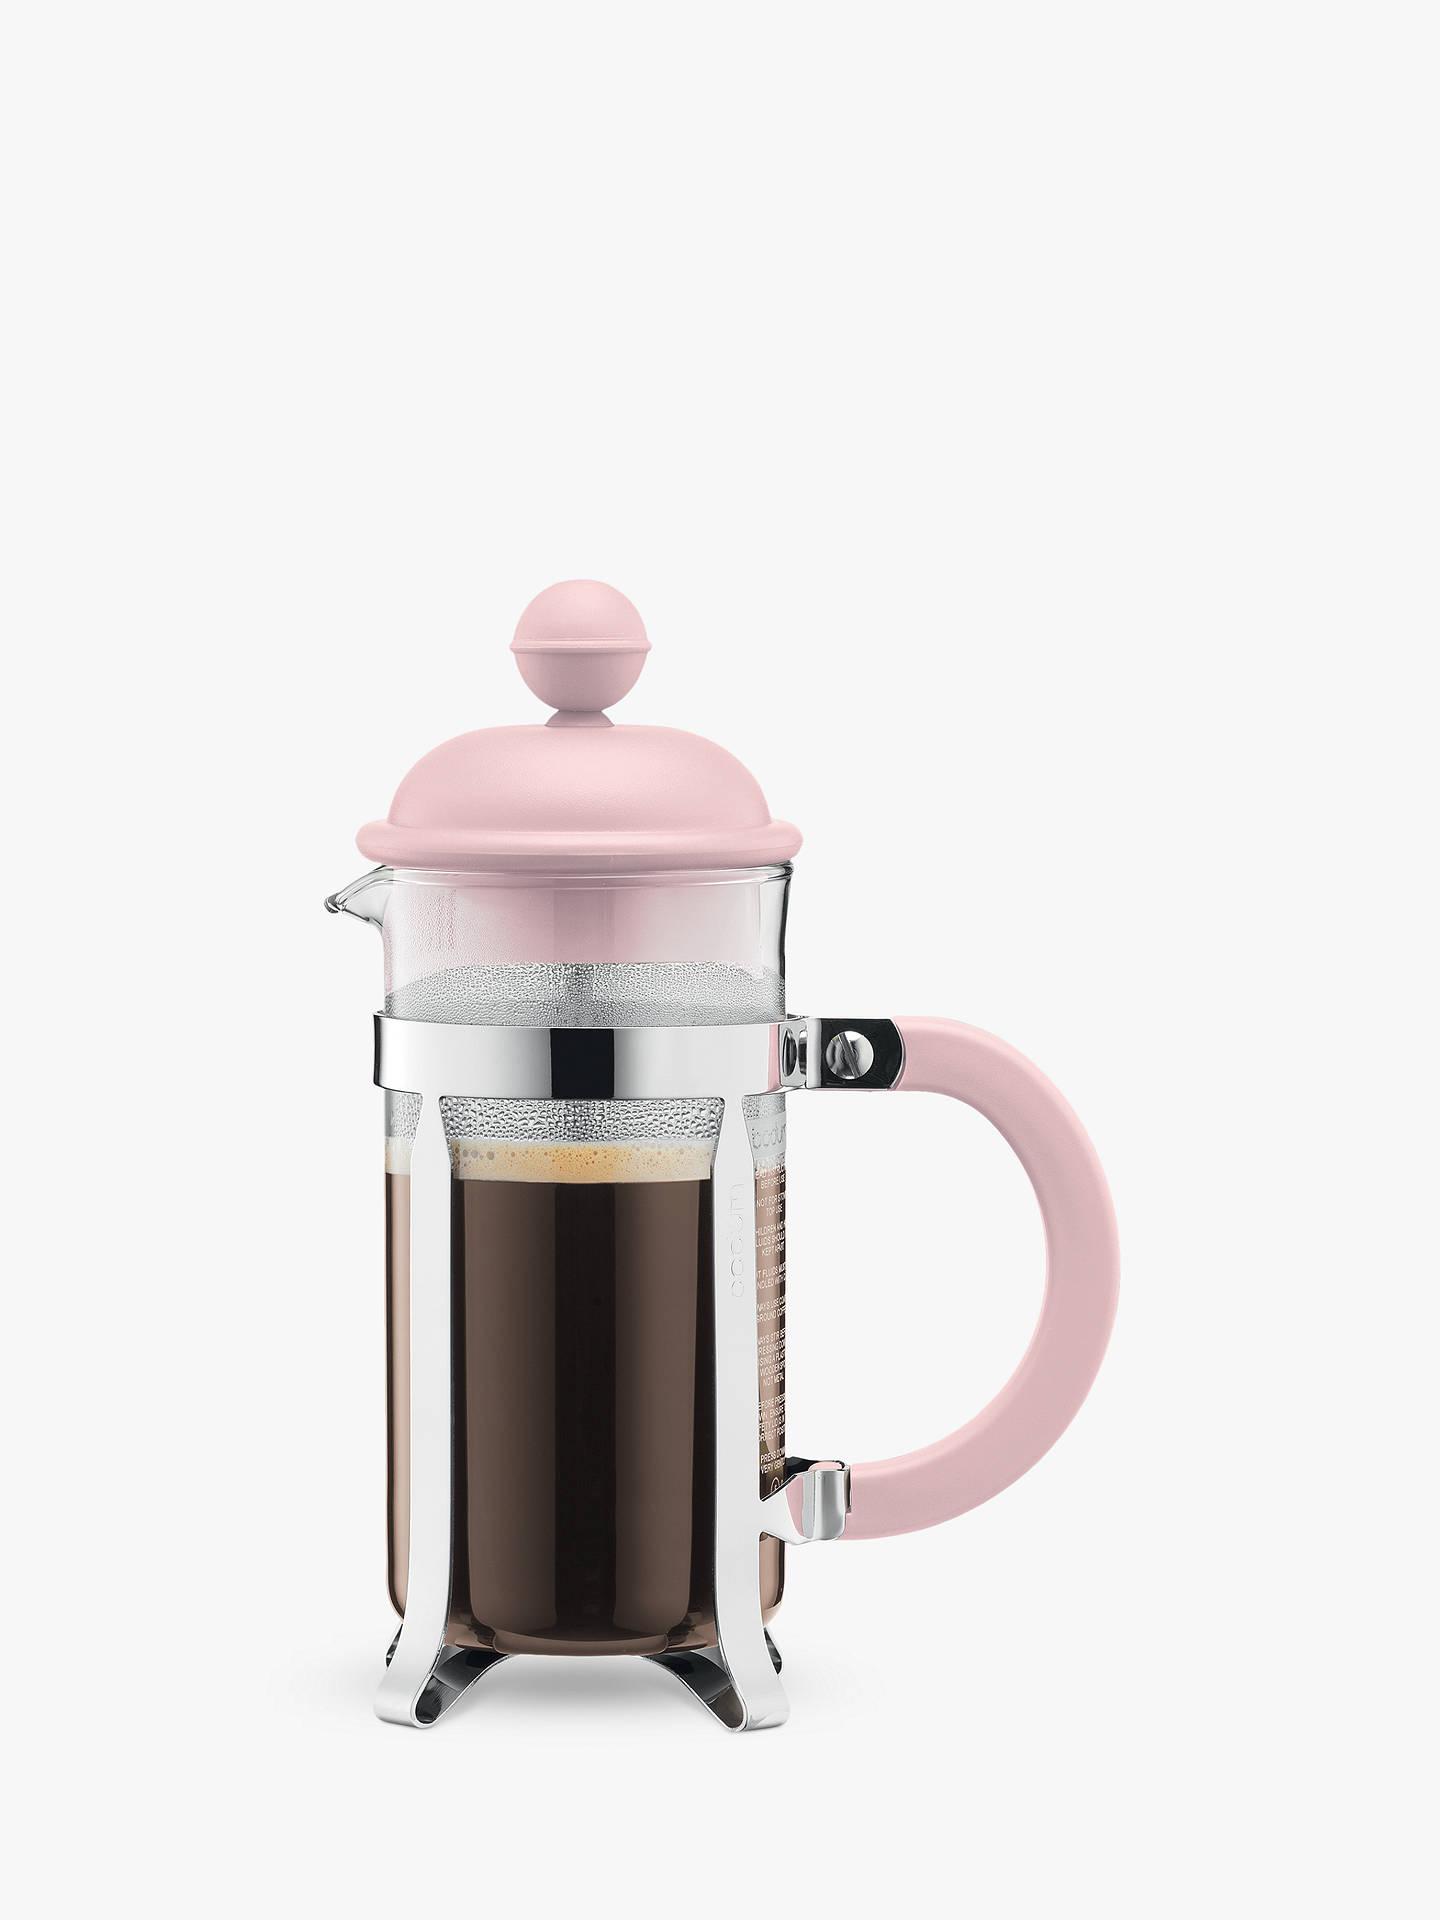 Bodum 3 Cup Caffetteria Coffee Maker 350ml Pink